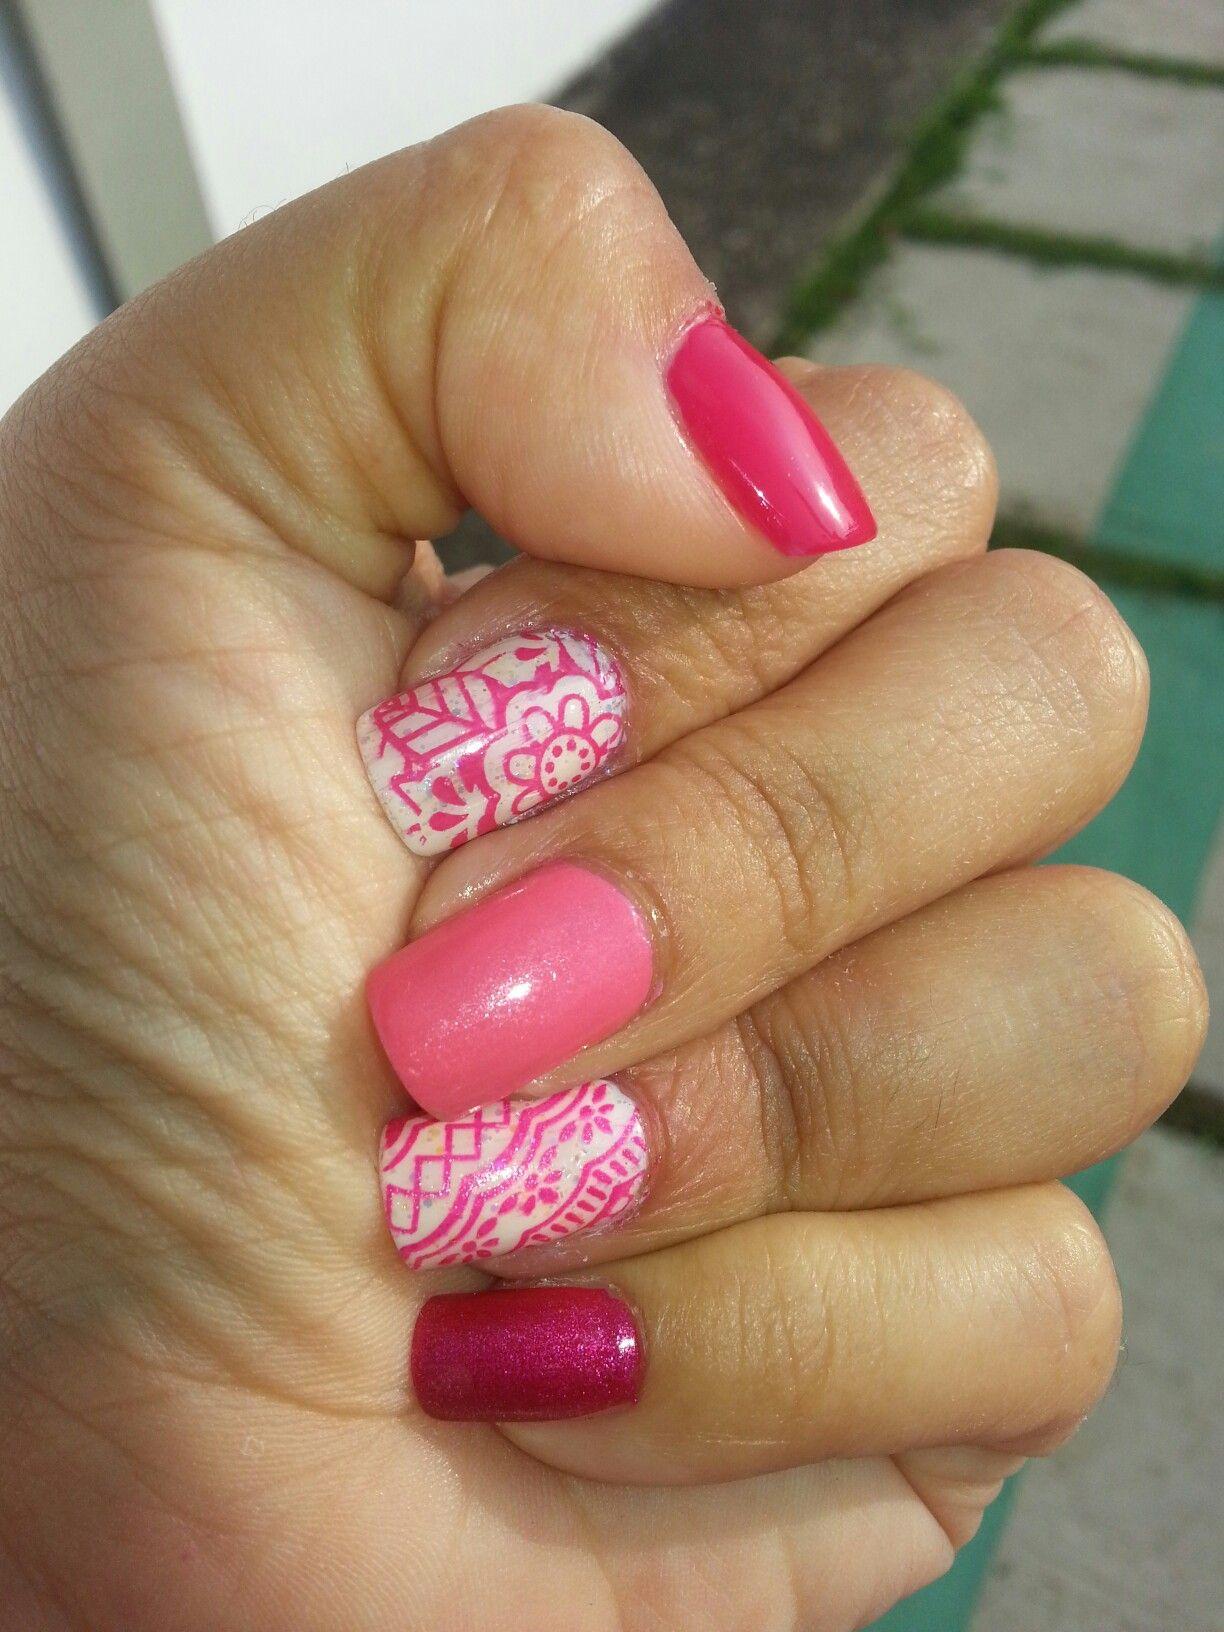 Uñas con diferentes tonos de rosado + stamping | Uñas Decoradas ...